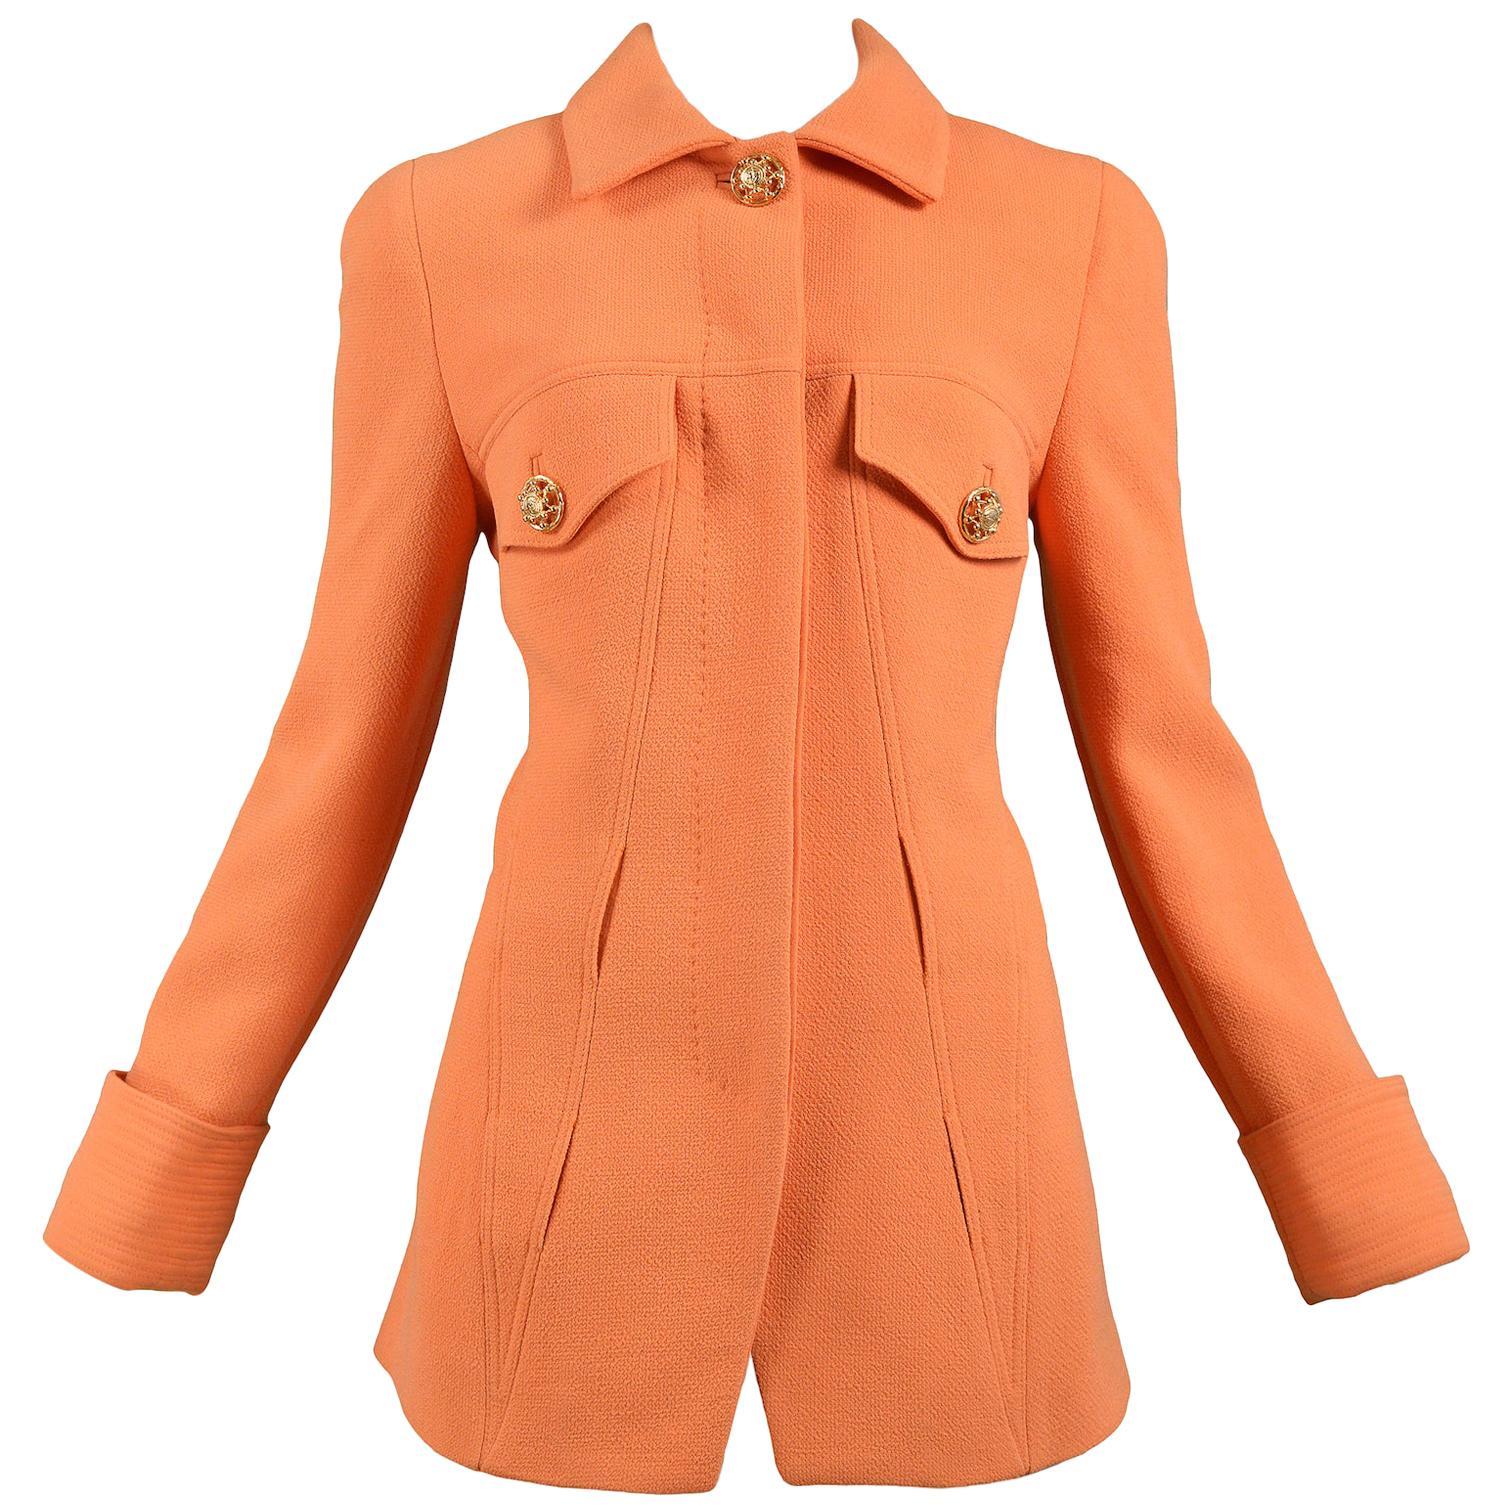 Vintage Versace Orange Blazer Jacket 1991